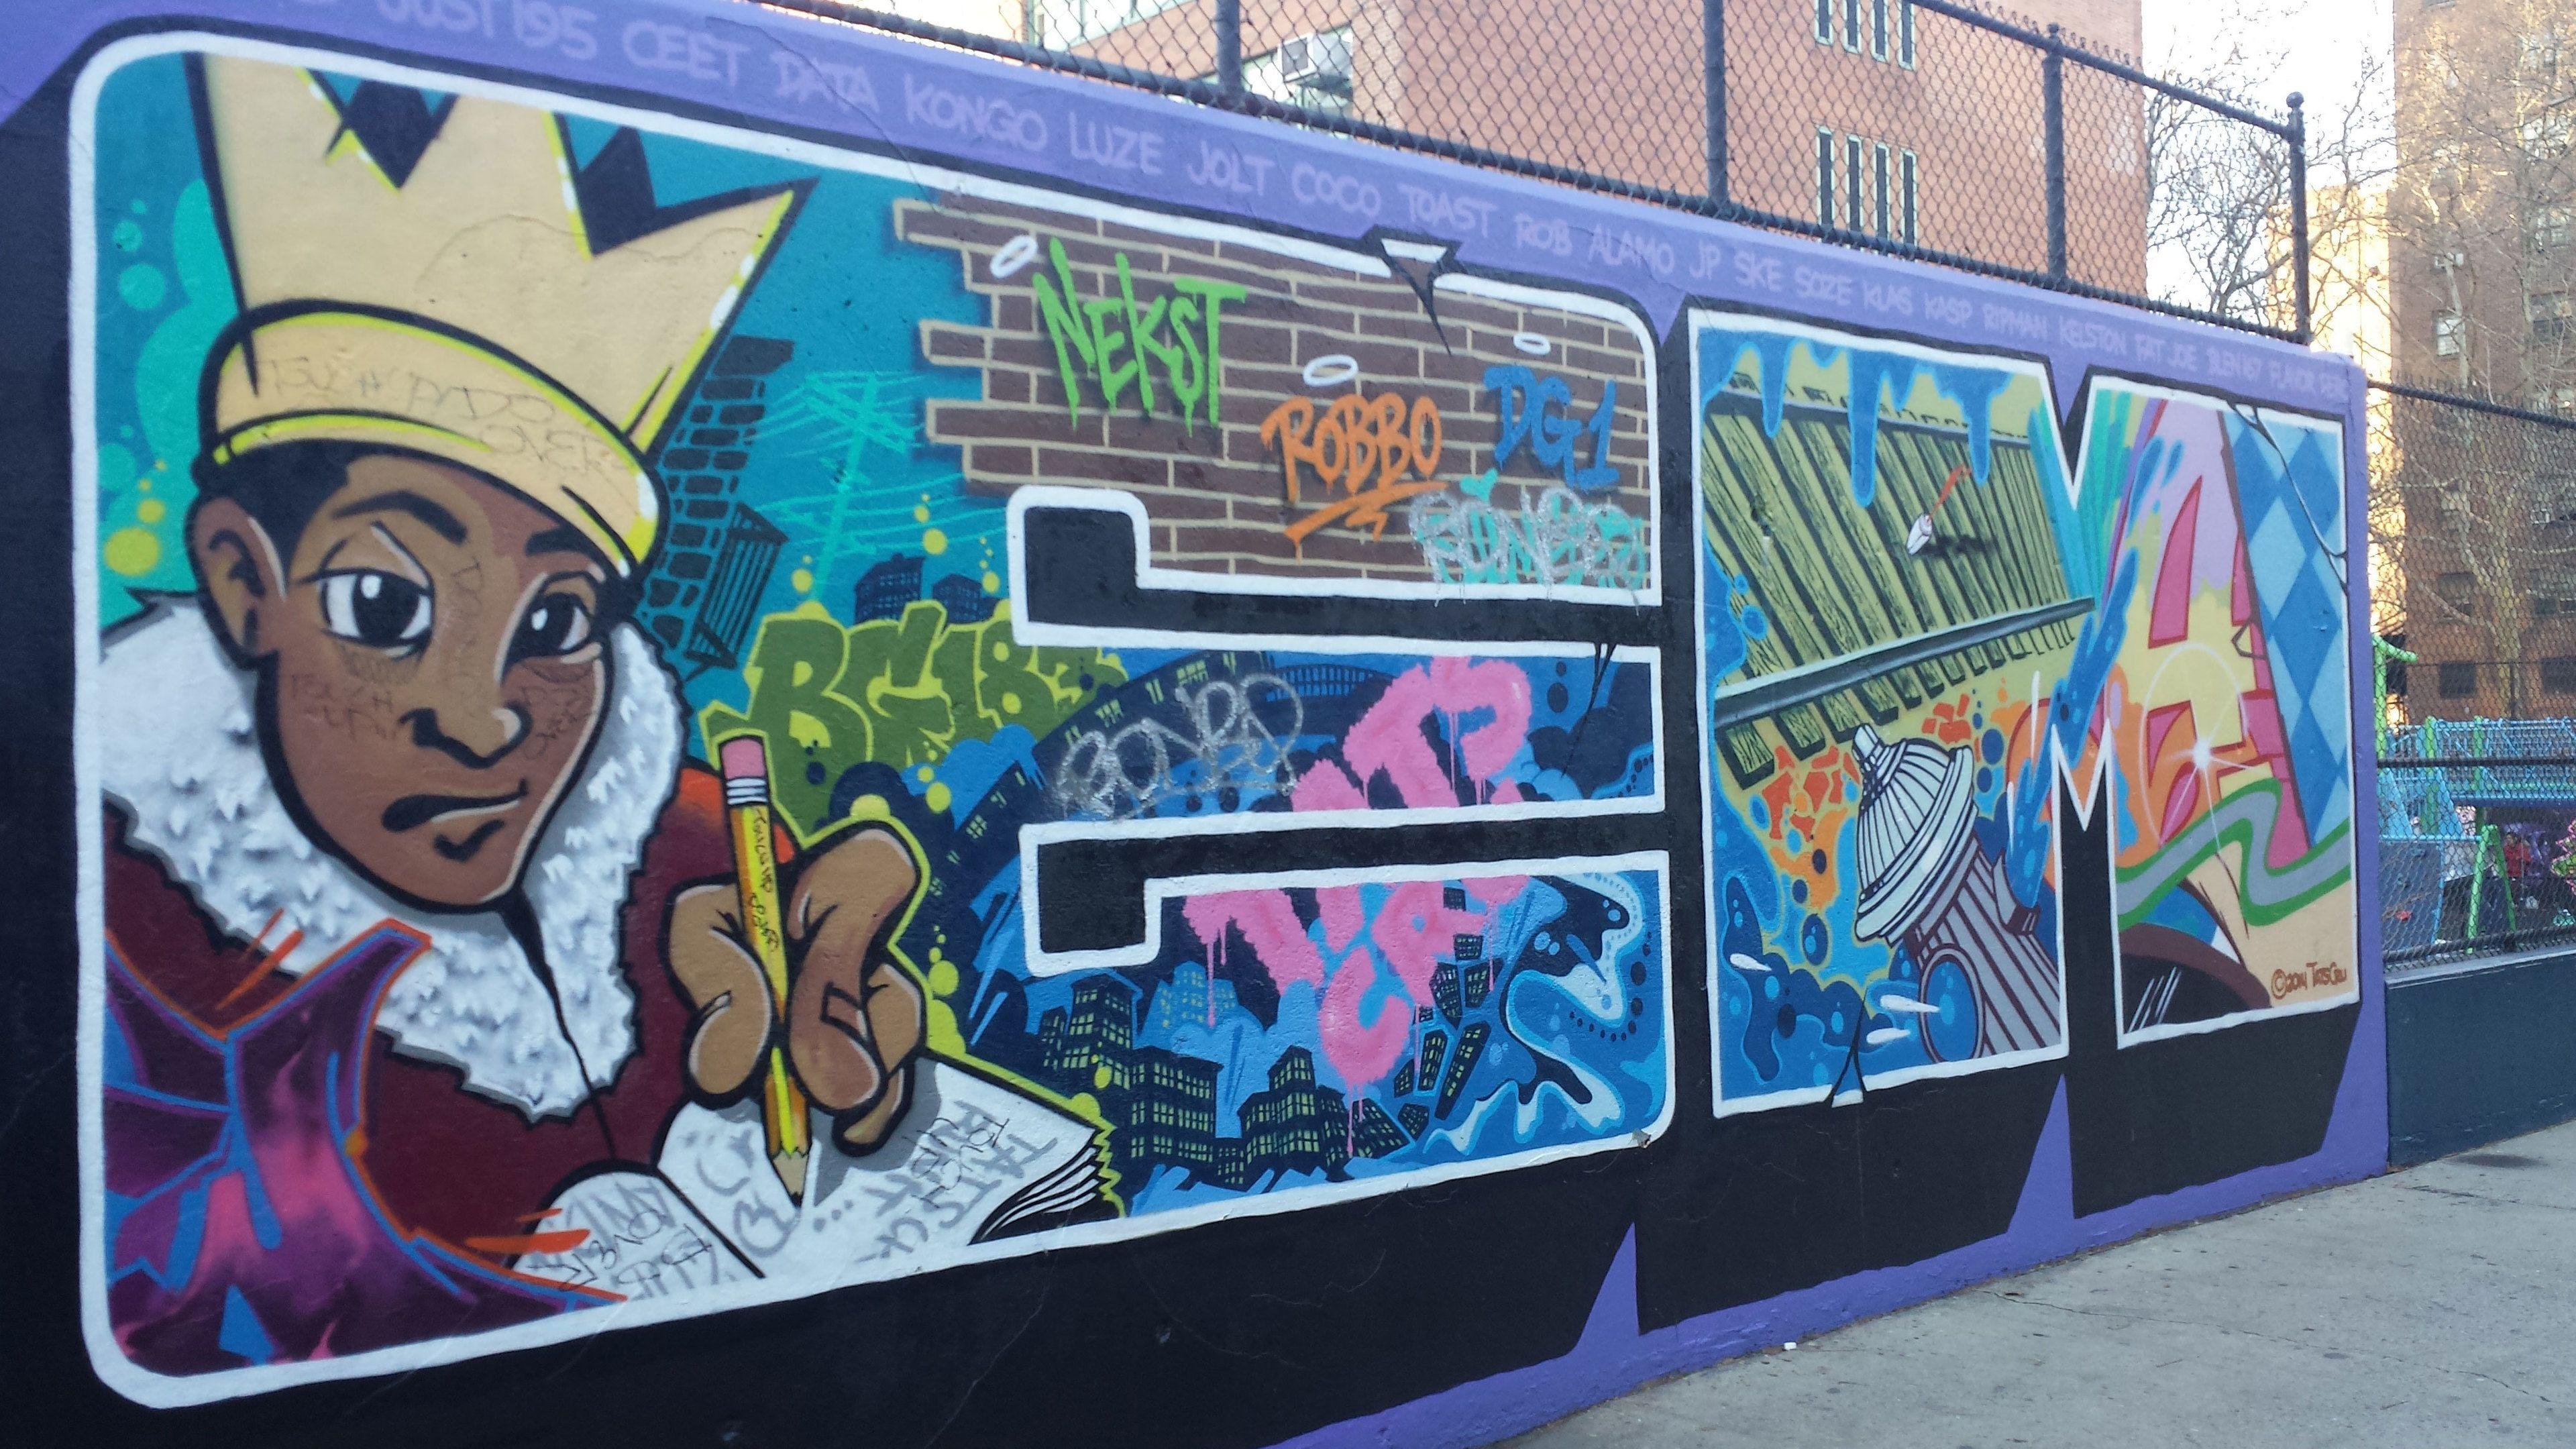 New York graffiti covered walls